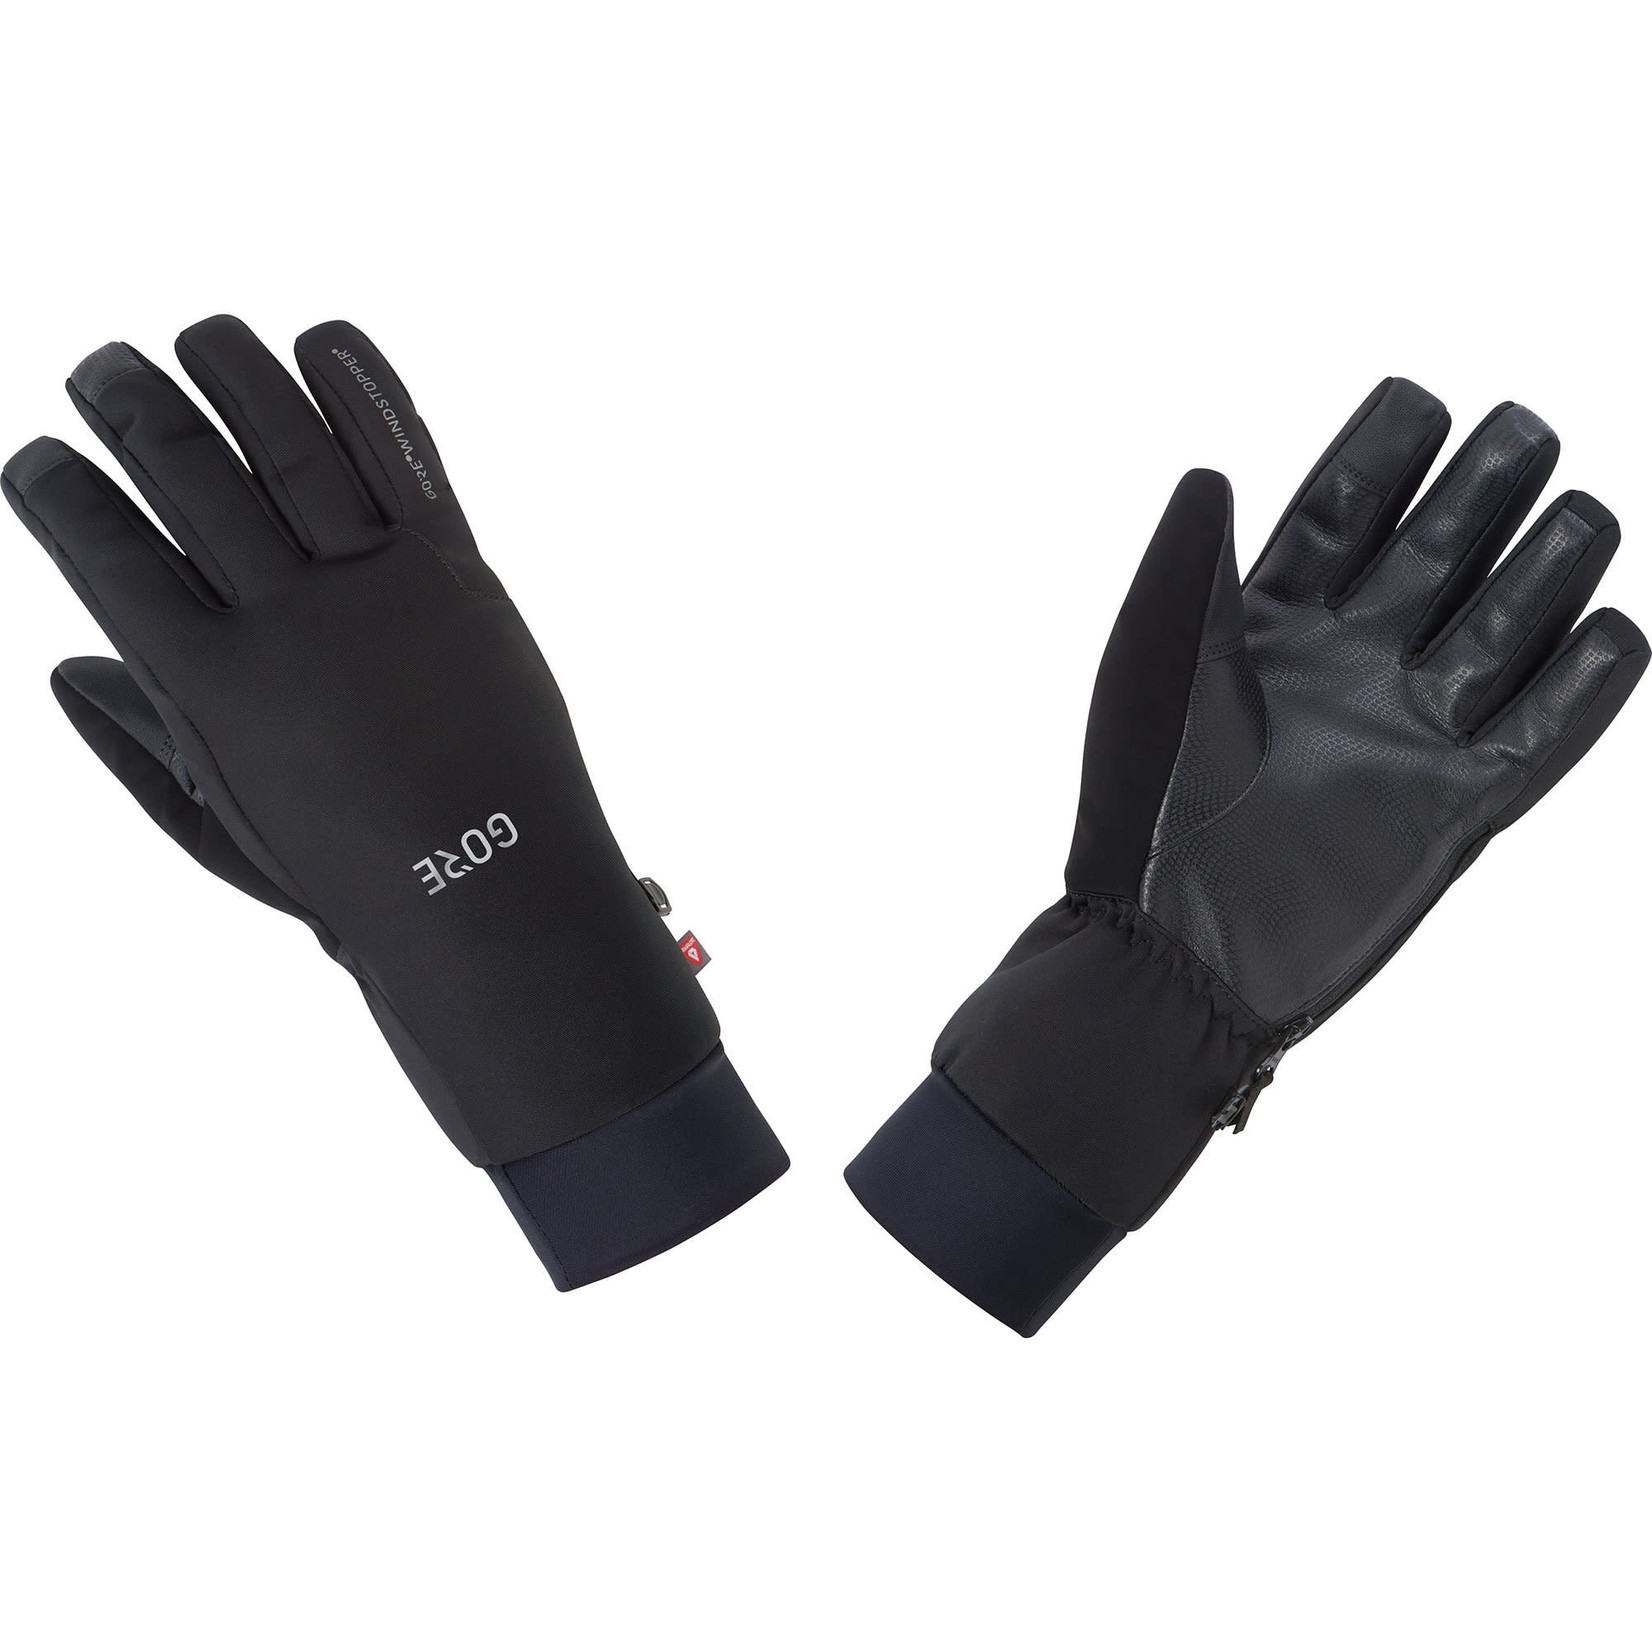 GORE Wear GORE WINDSTOPPER Insulated Gloves